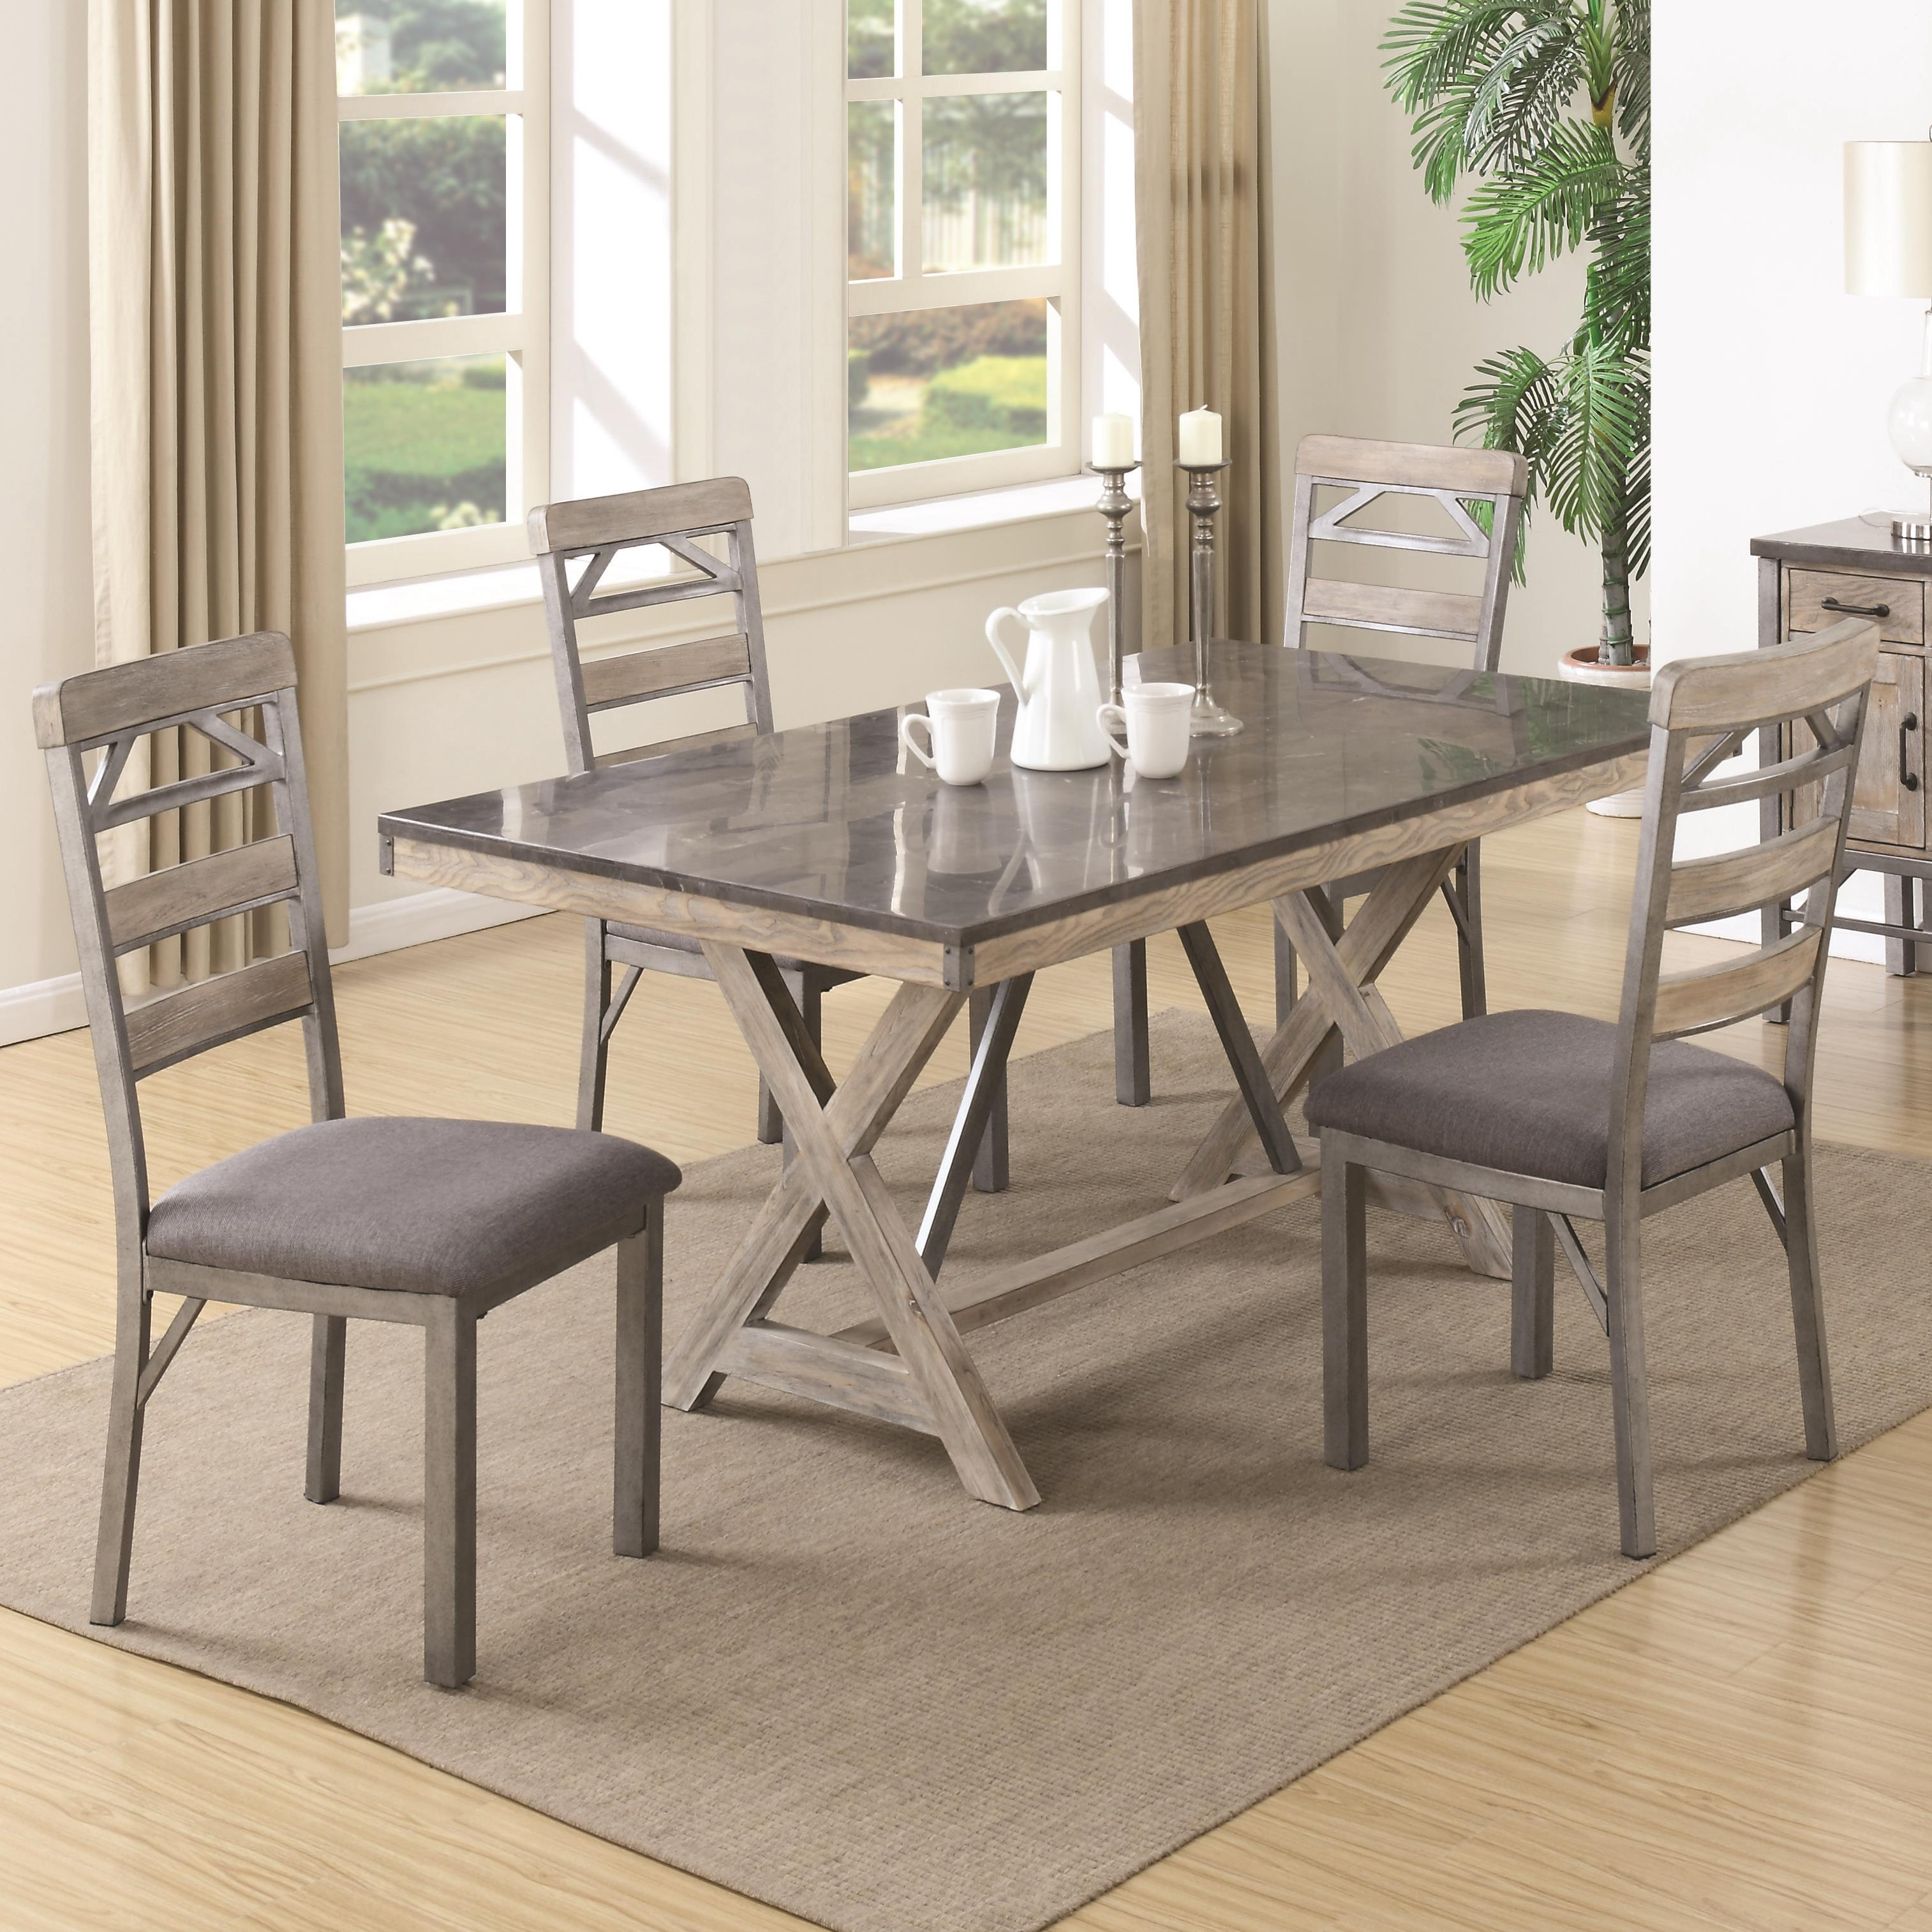 Coaster Edmonton 5 Piece Table & Chair Set - Item Number: 106321+4x106322